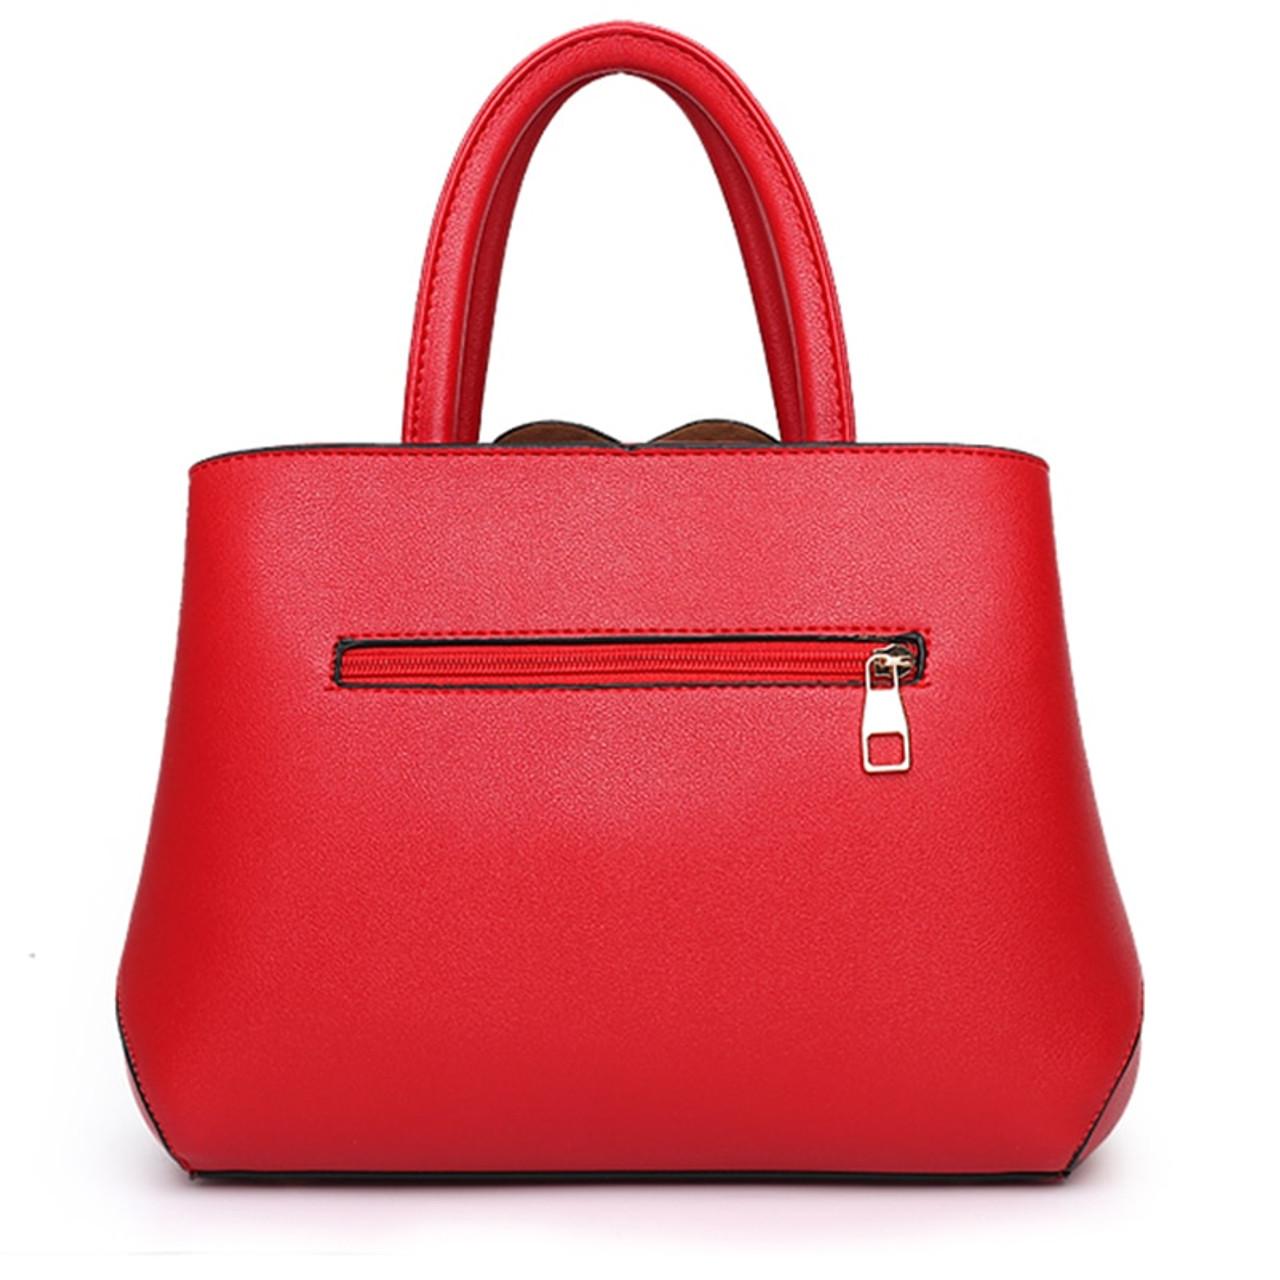 3a1dbf315154 ... Nevenka Floral Handbags Women Leather Handbag Black Shoulder Bag Large  Capacity Crossbody Bag for Girls Purse ...